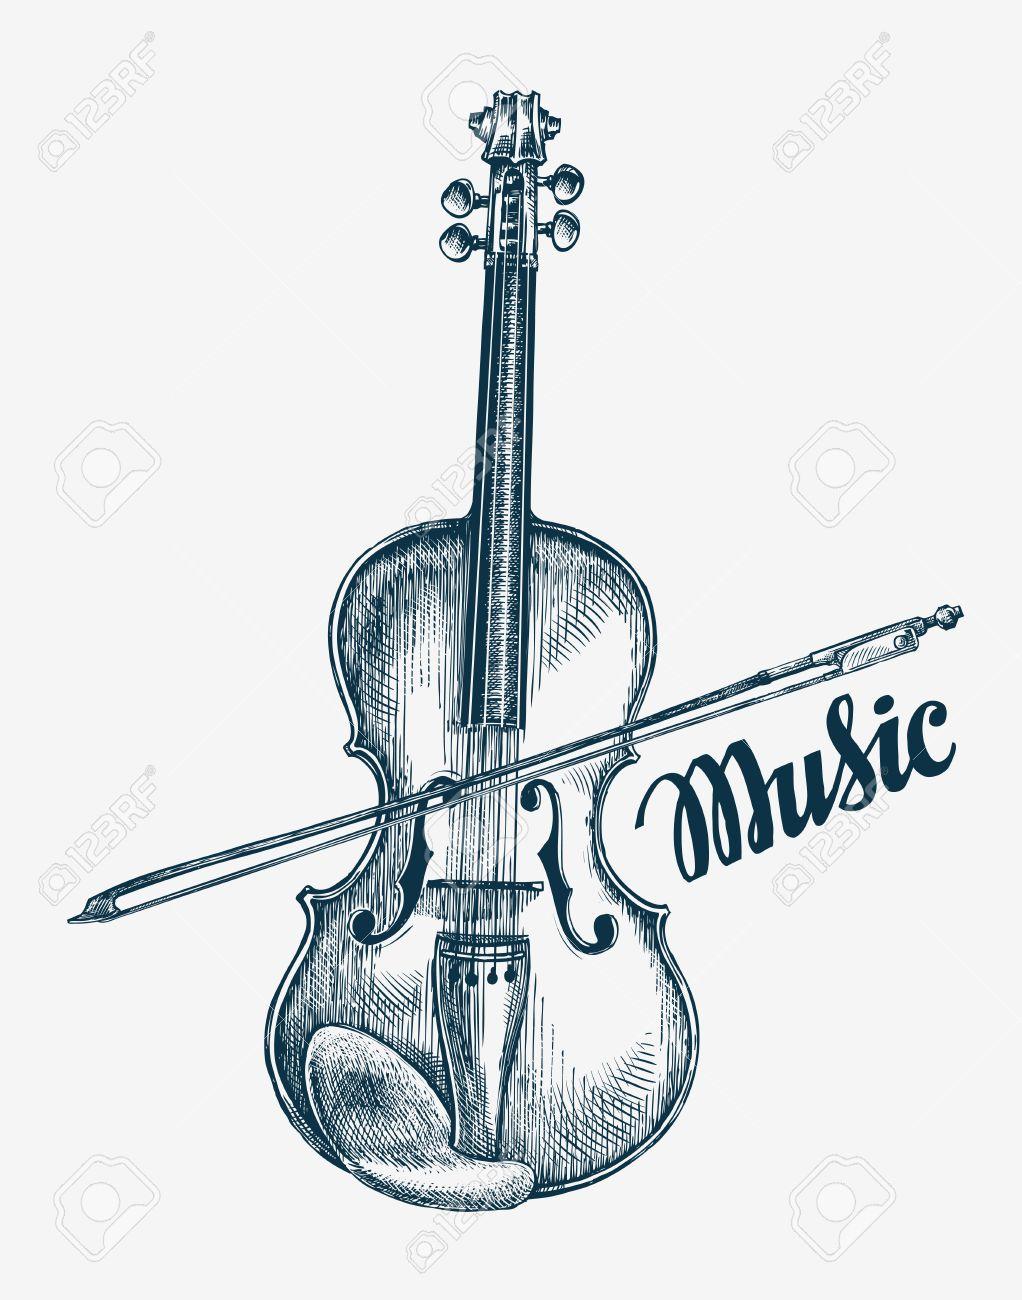 1022x1300 Hand Drawn Violin Vector Illustration. Sketch Musical Instrument